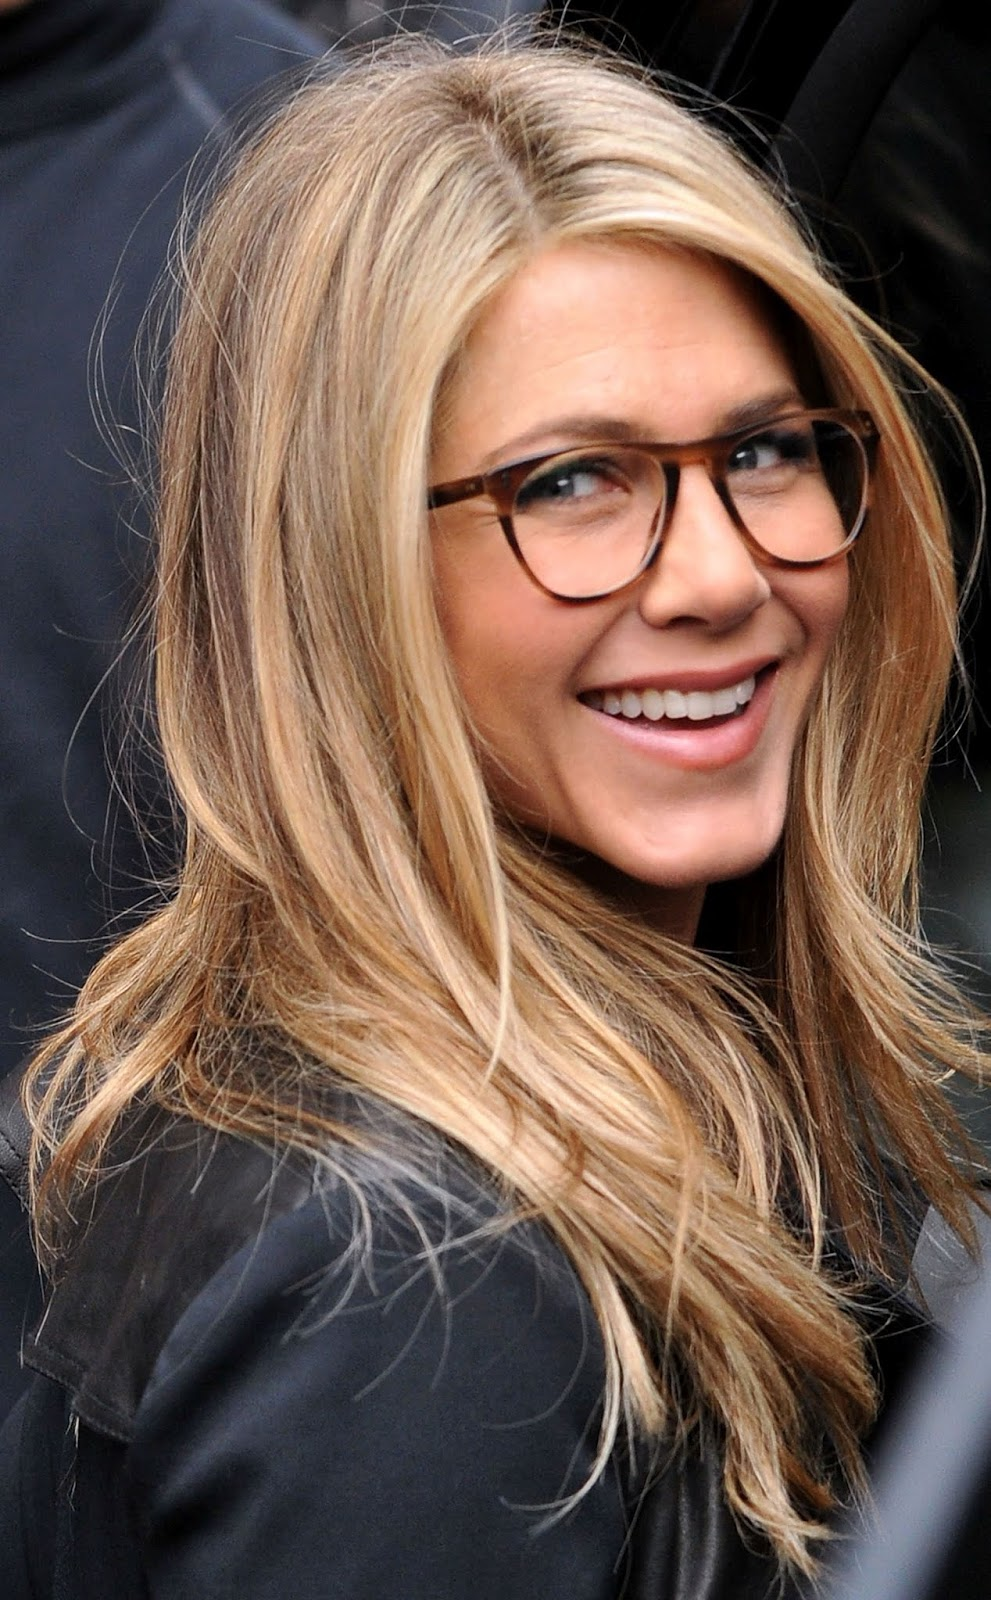 14 Sexy Photos Gallery - Jennifer Aniston 100% Hot Pics # ...